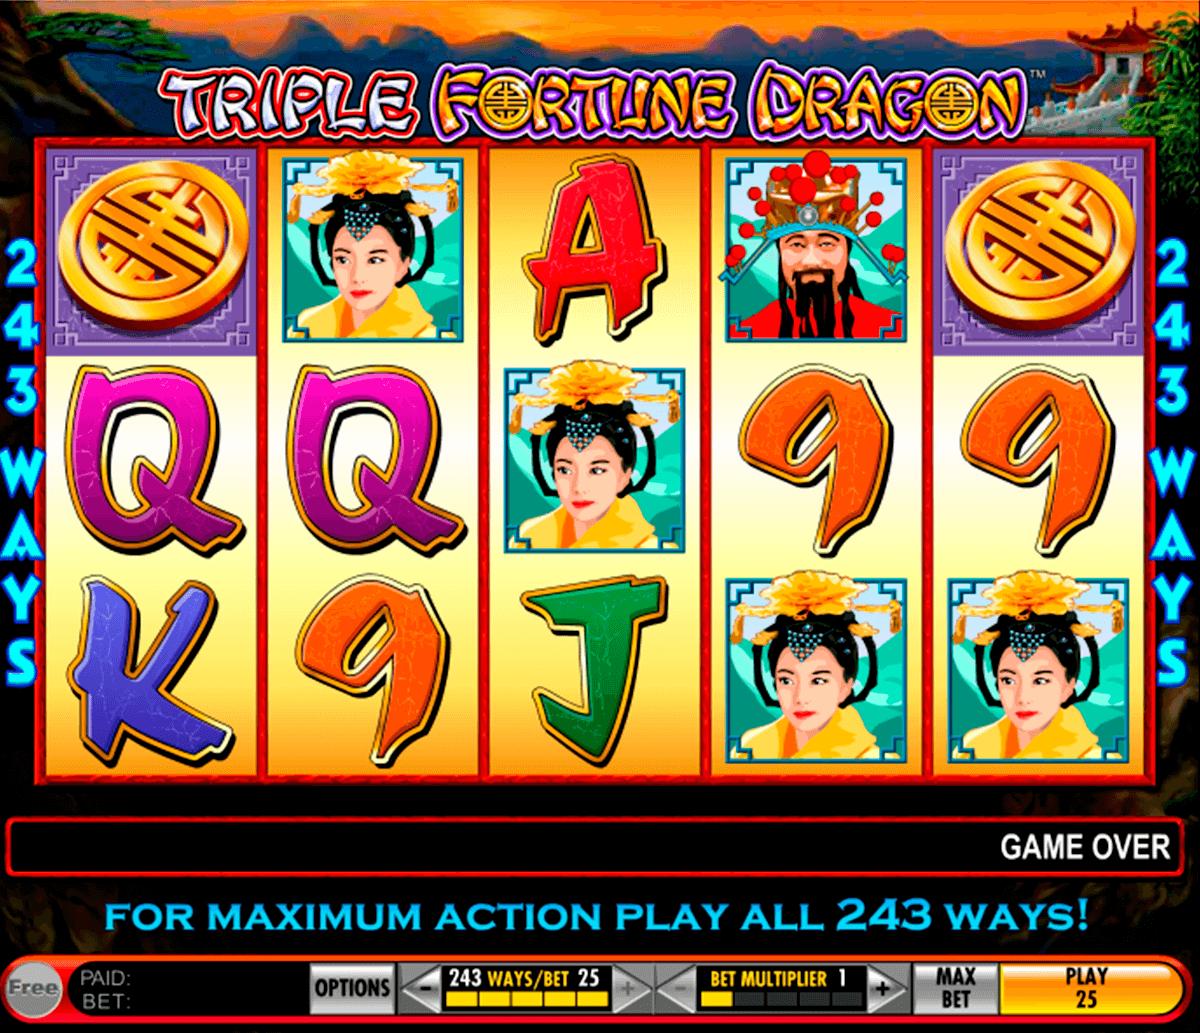 triple fortune dragon igt tragamonedas gratis